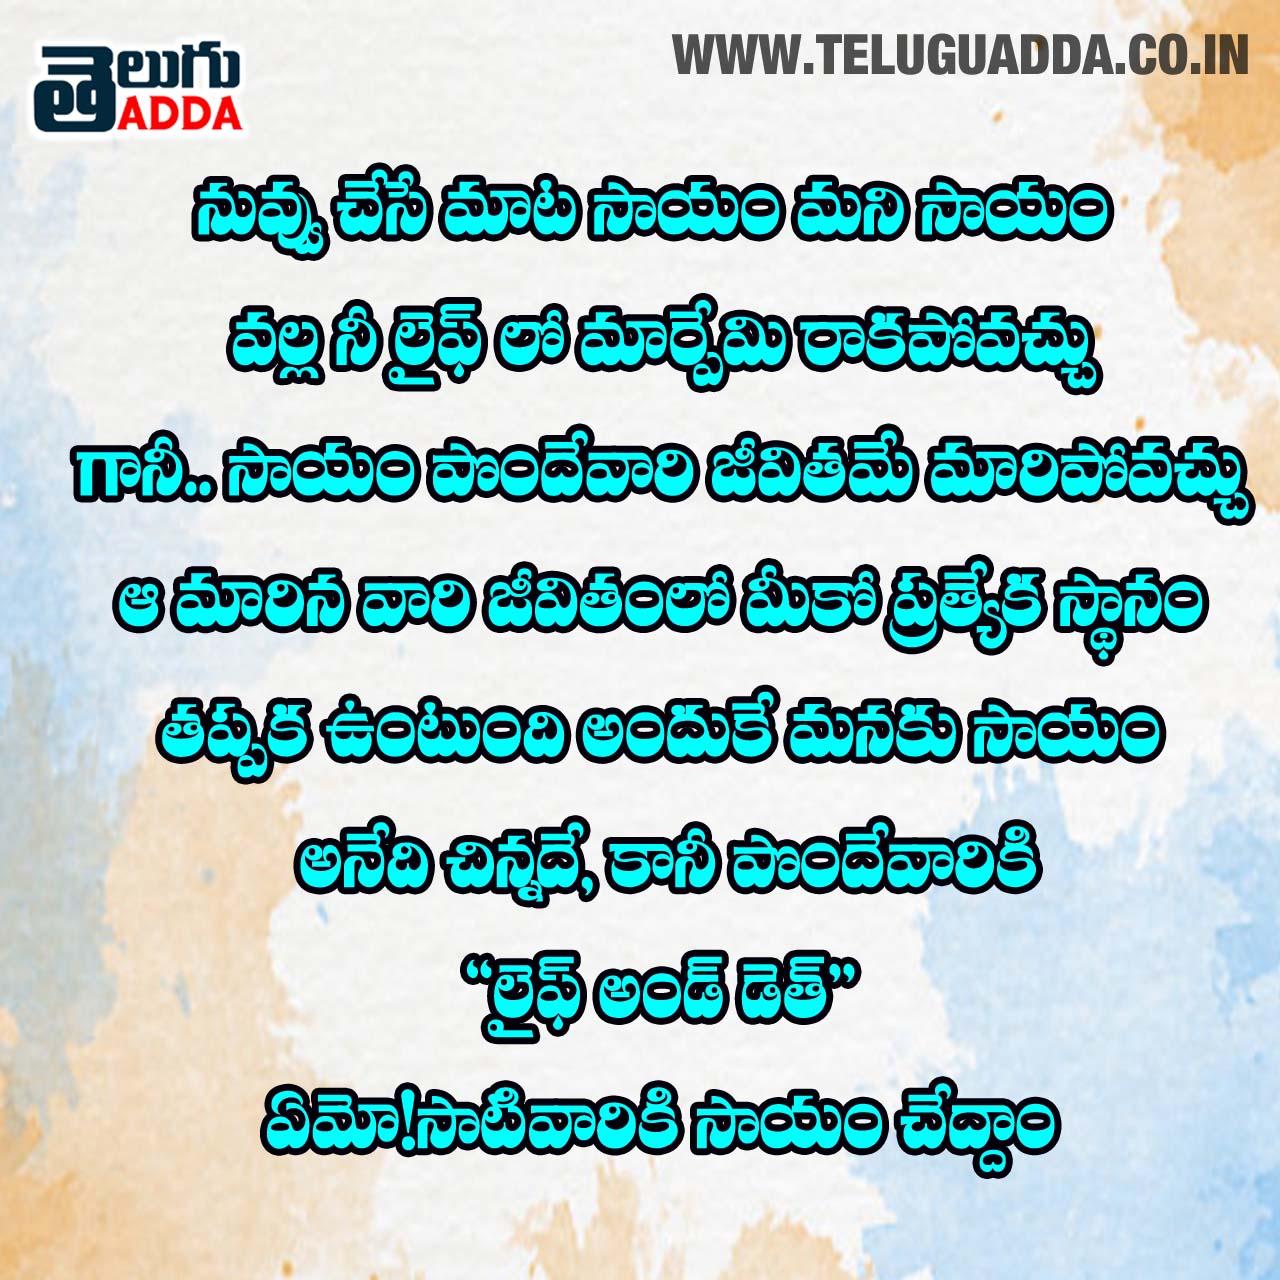 Best Telugu Whatsapp Quotes 2021